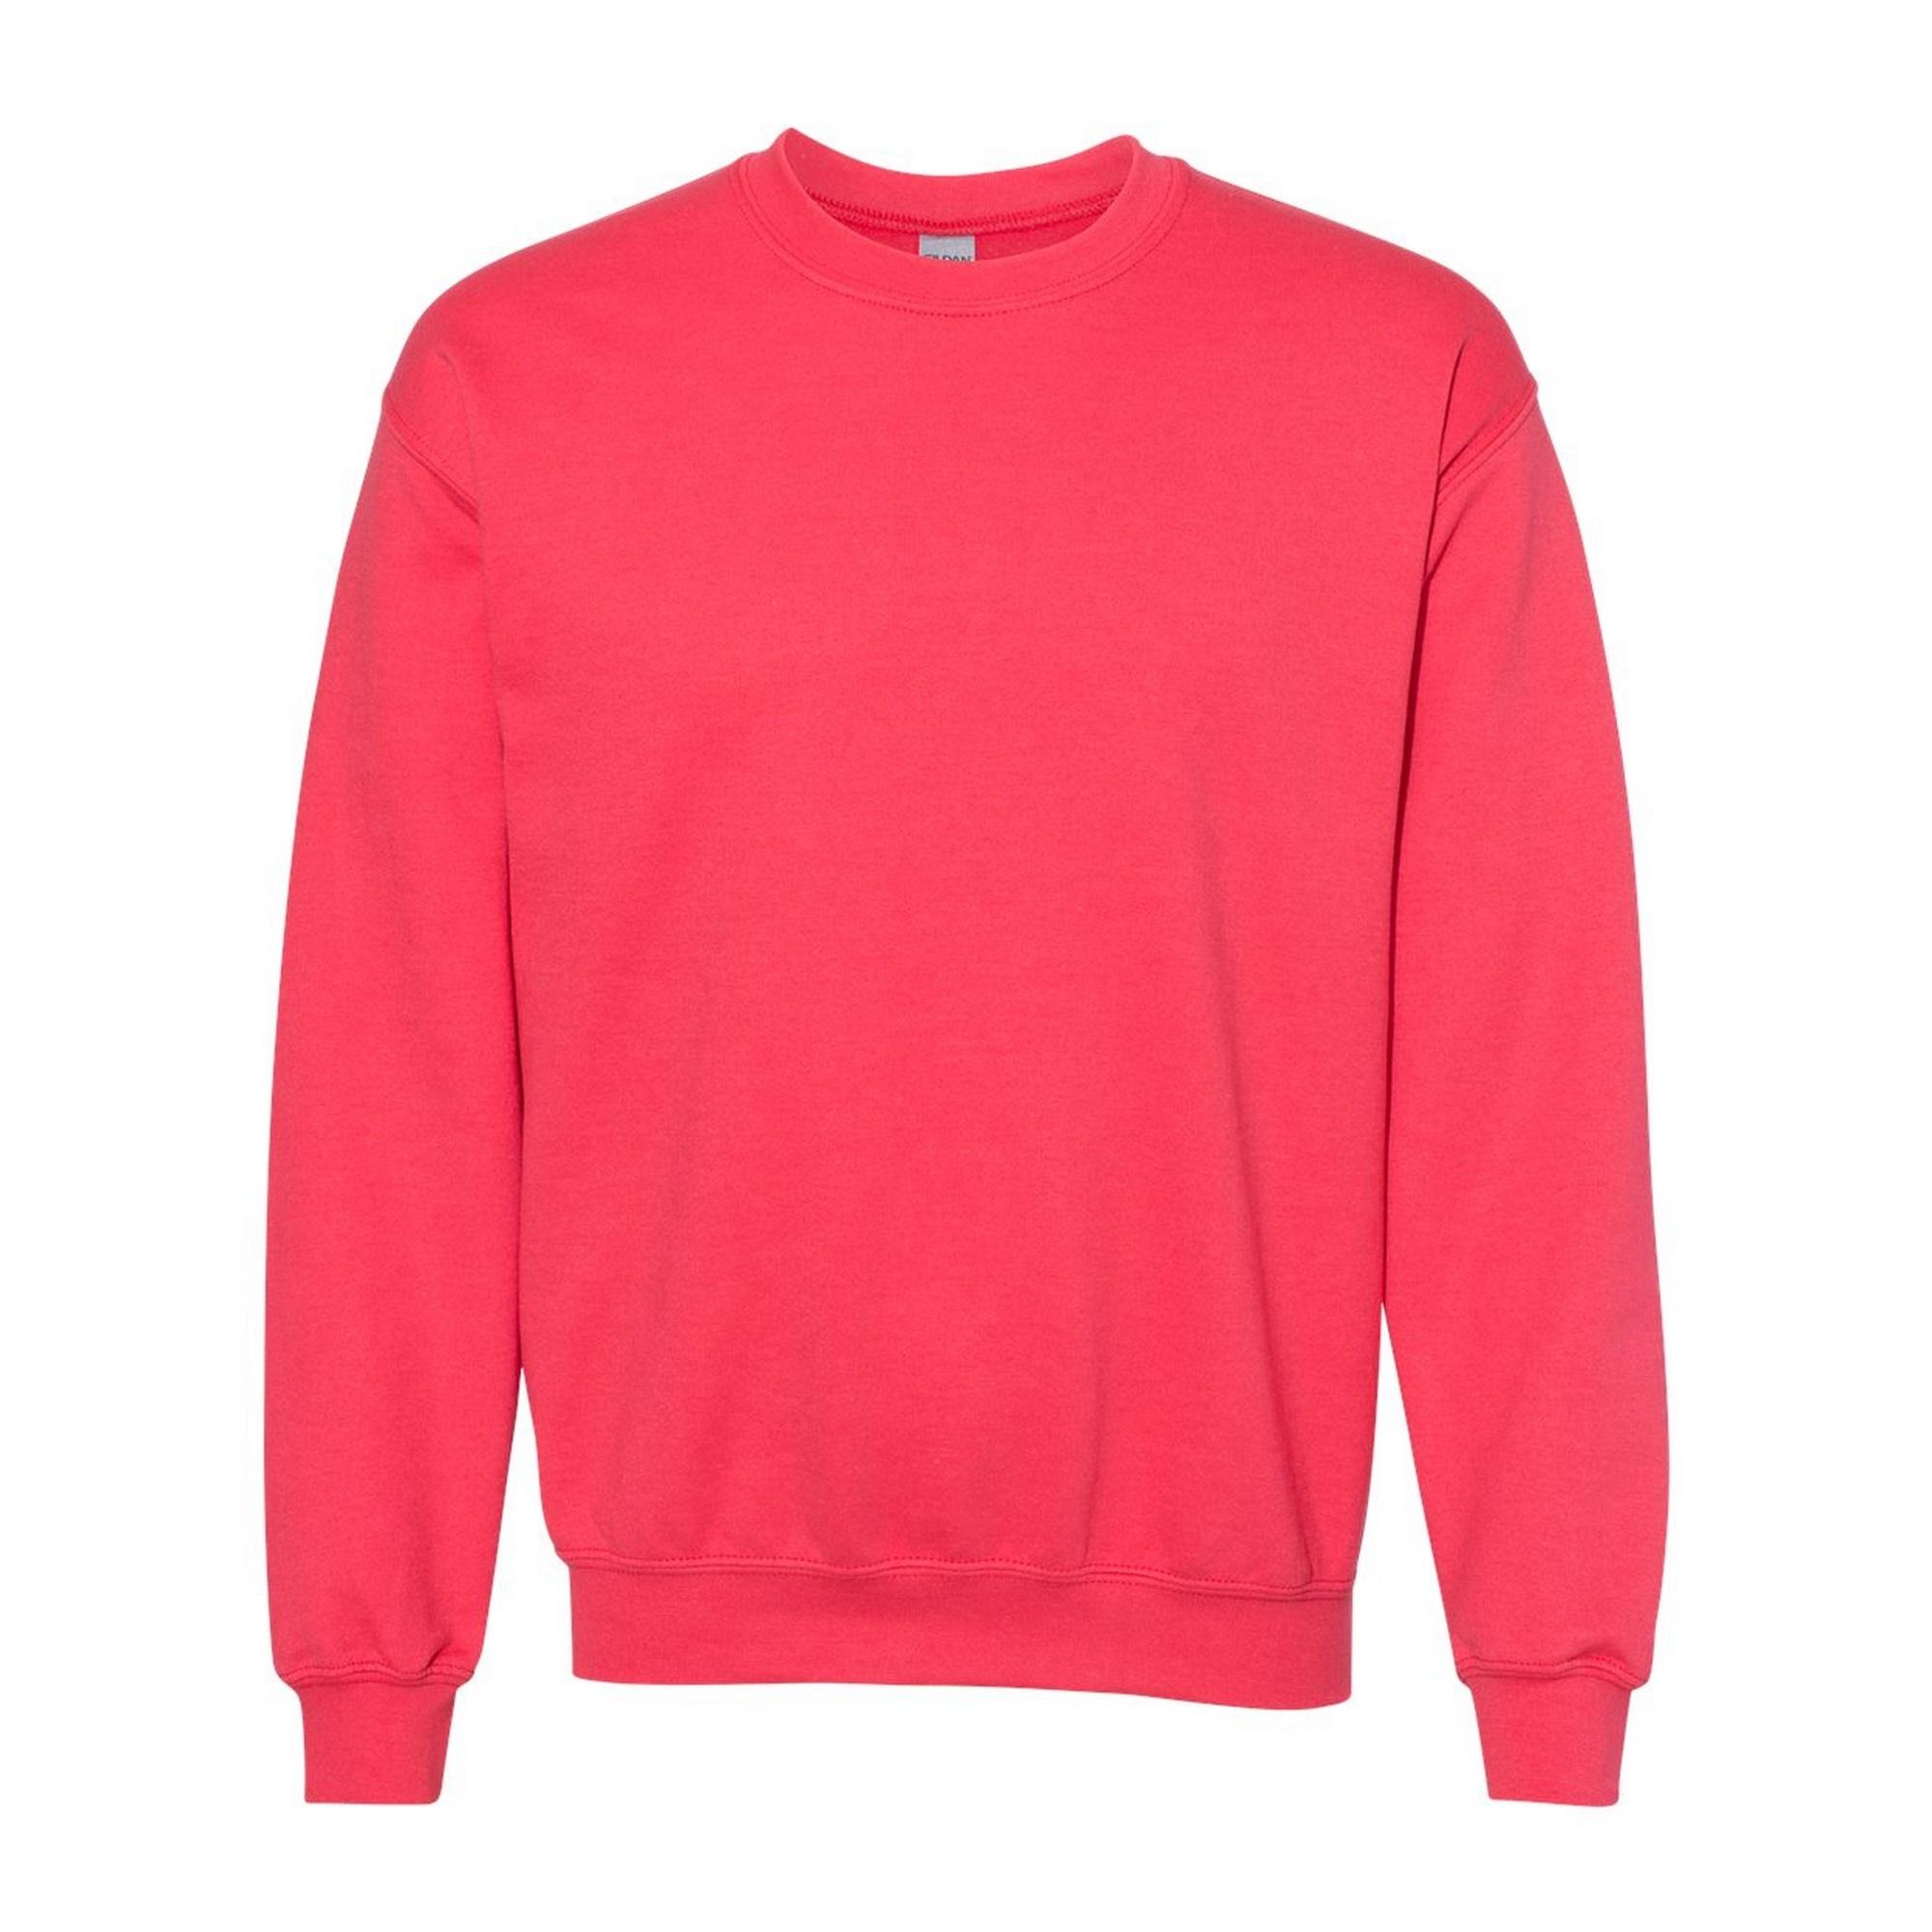 Gildan S-2XL BC463 Sweatshirt Adulte unisexe 32 couleurs